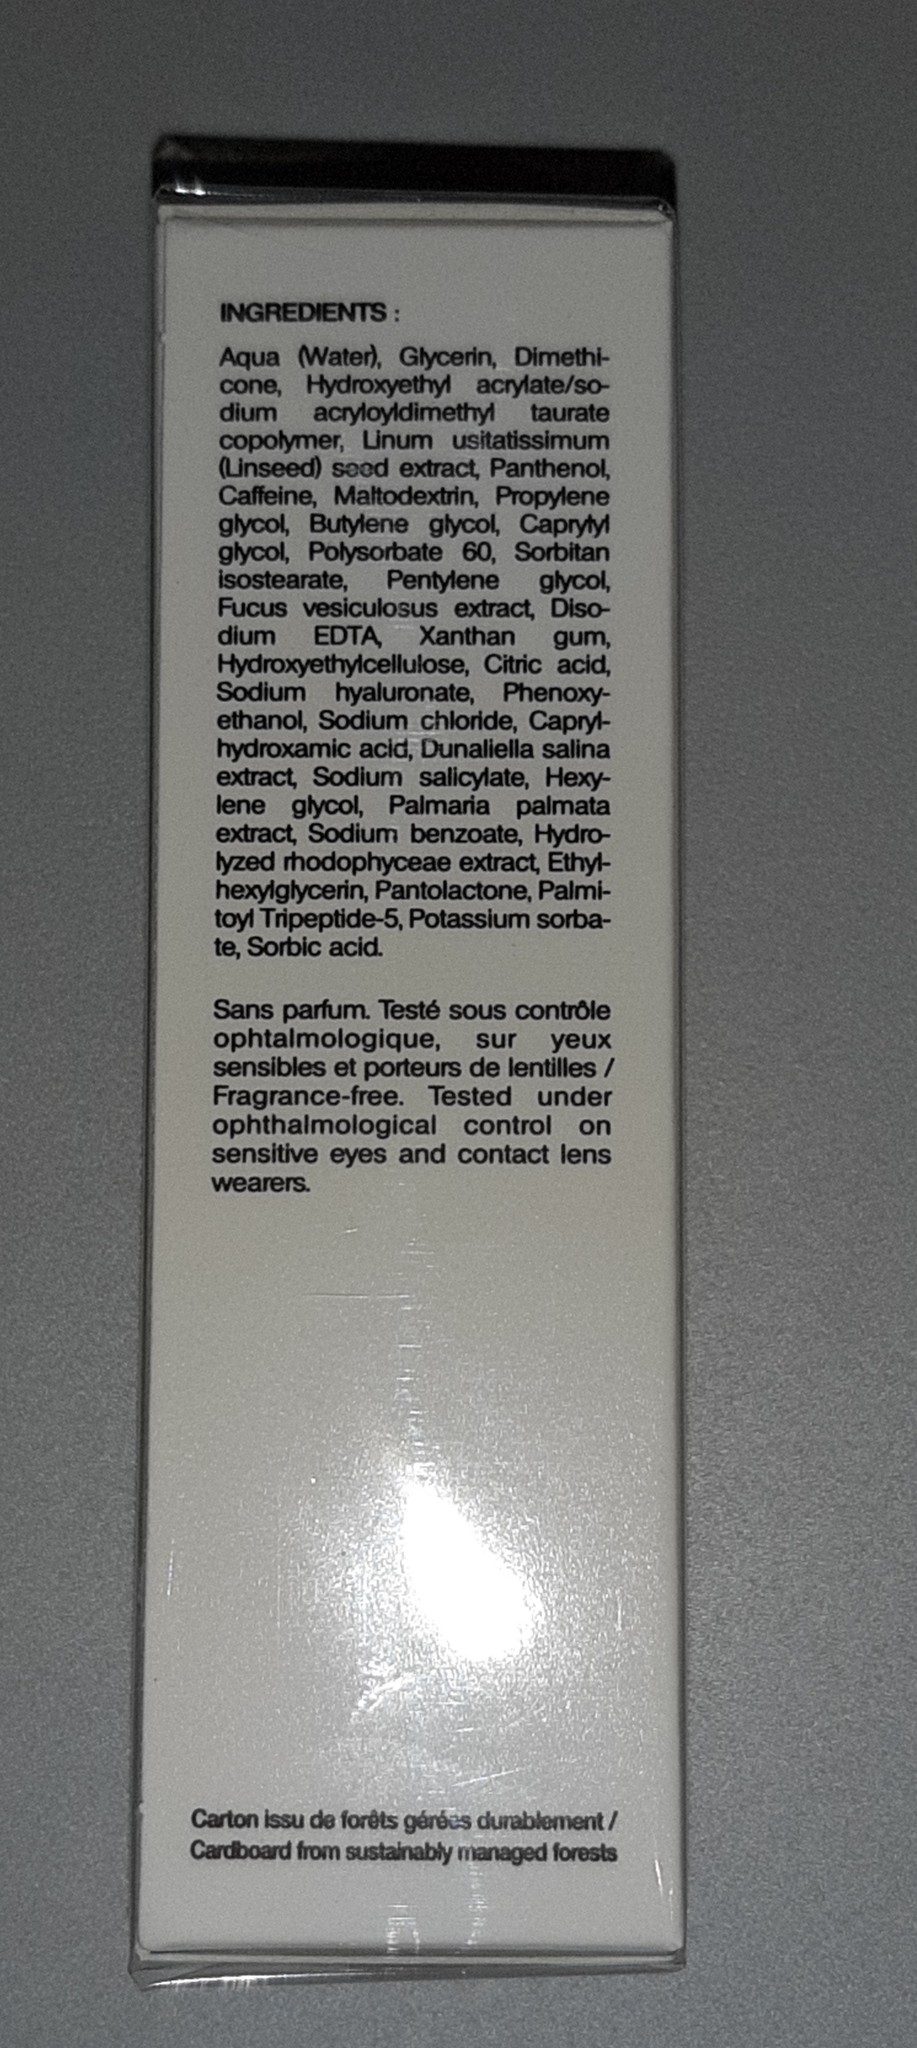 Sothys Cryo roll-on tegen wallen onder de ogen / Roll-on Cryo anti-poches Sothys